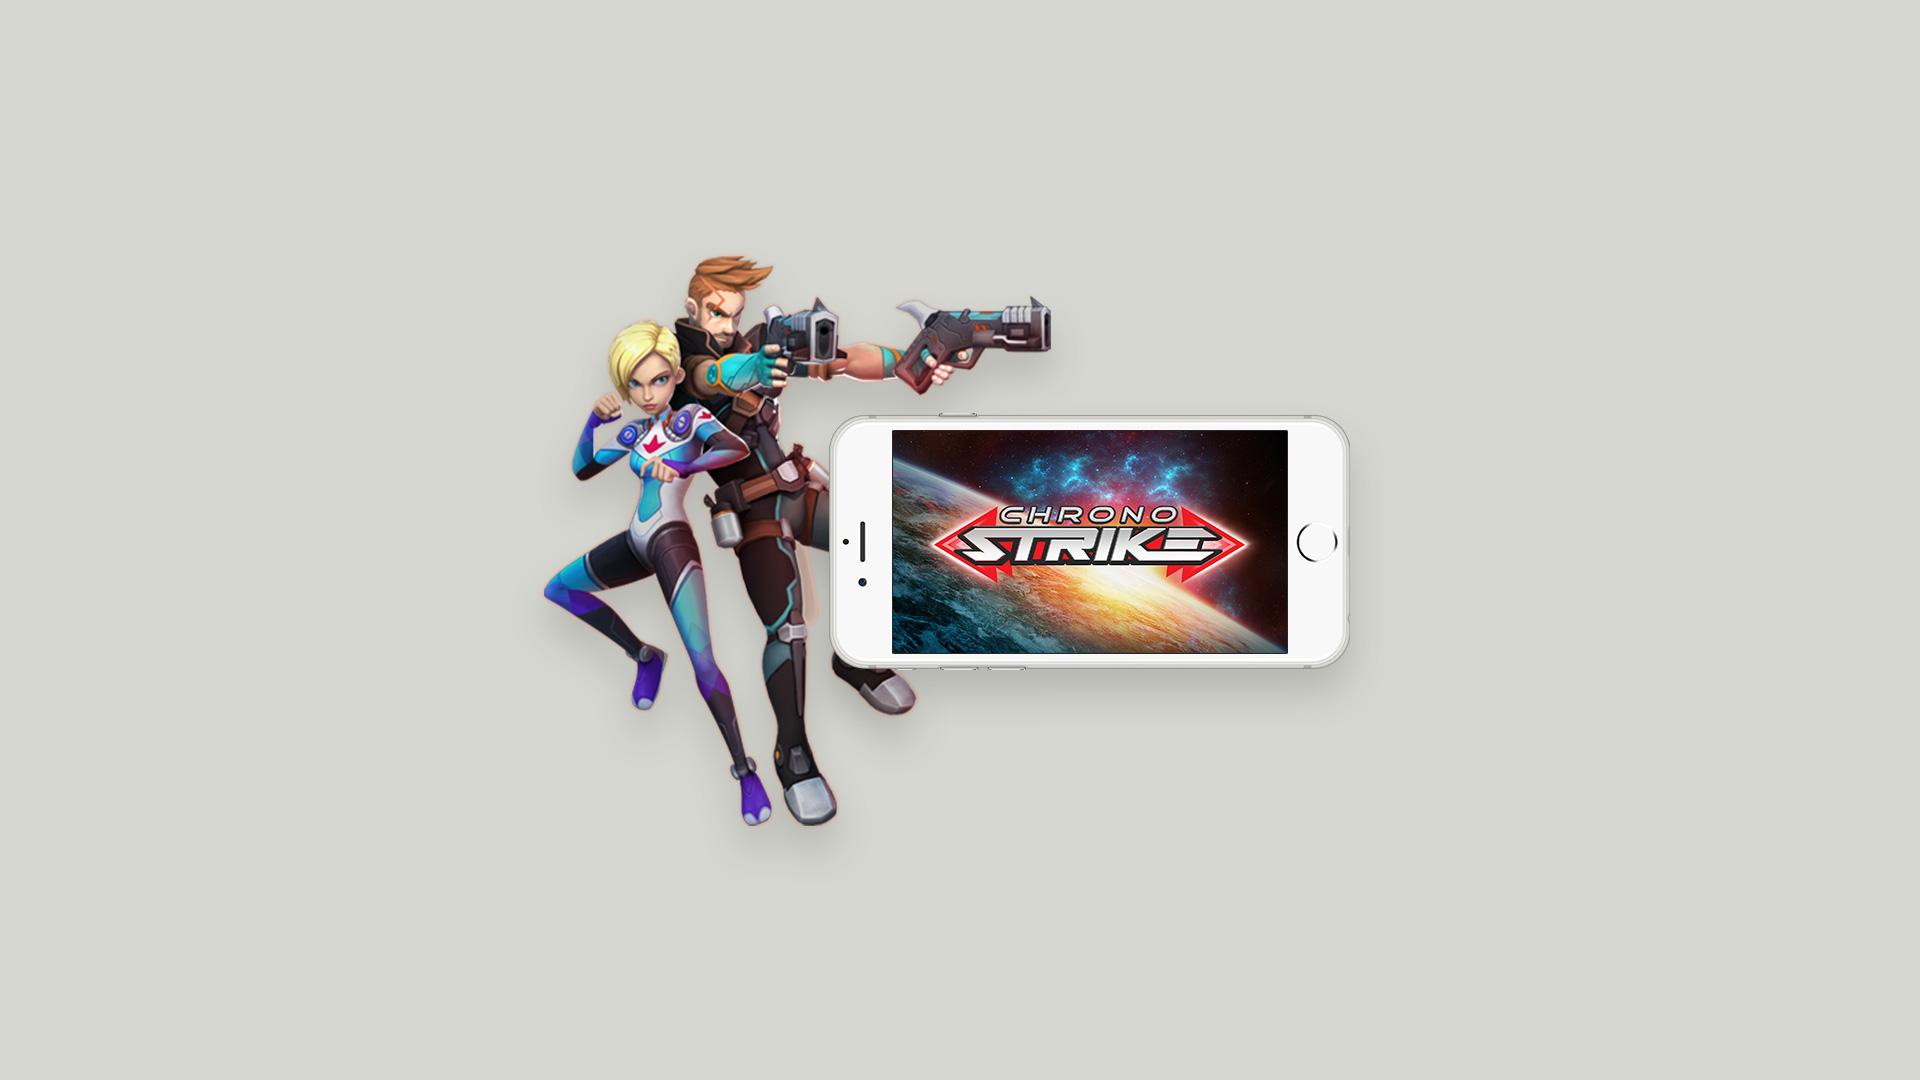 Chrono Strike